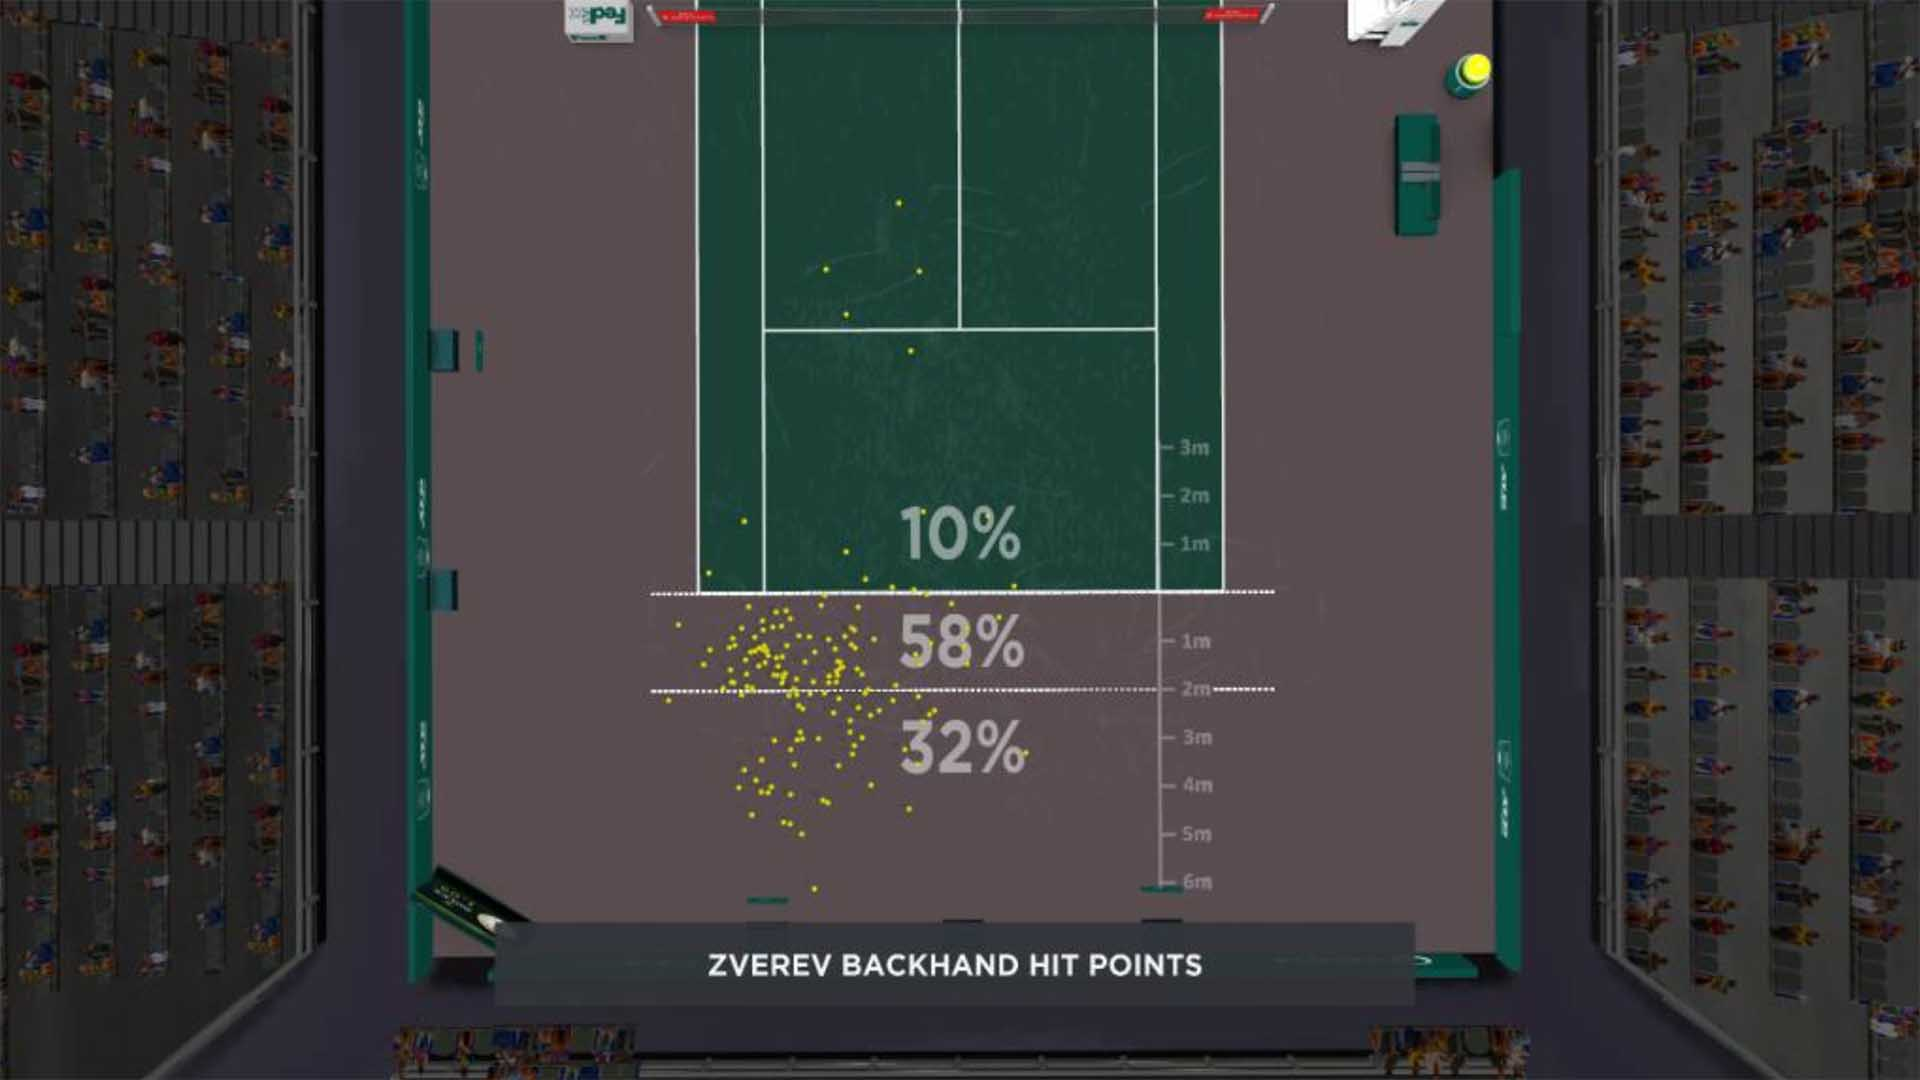 Zverev Backhand Hit Points Paris 2020 Final